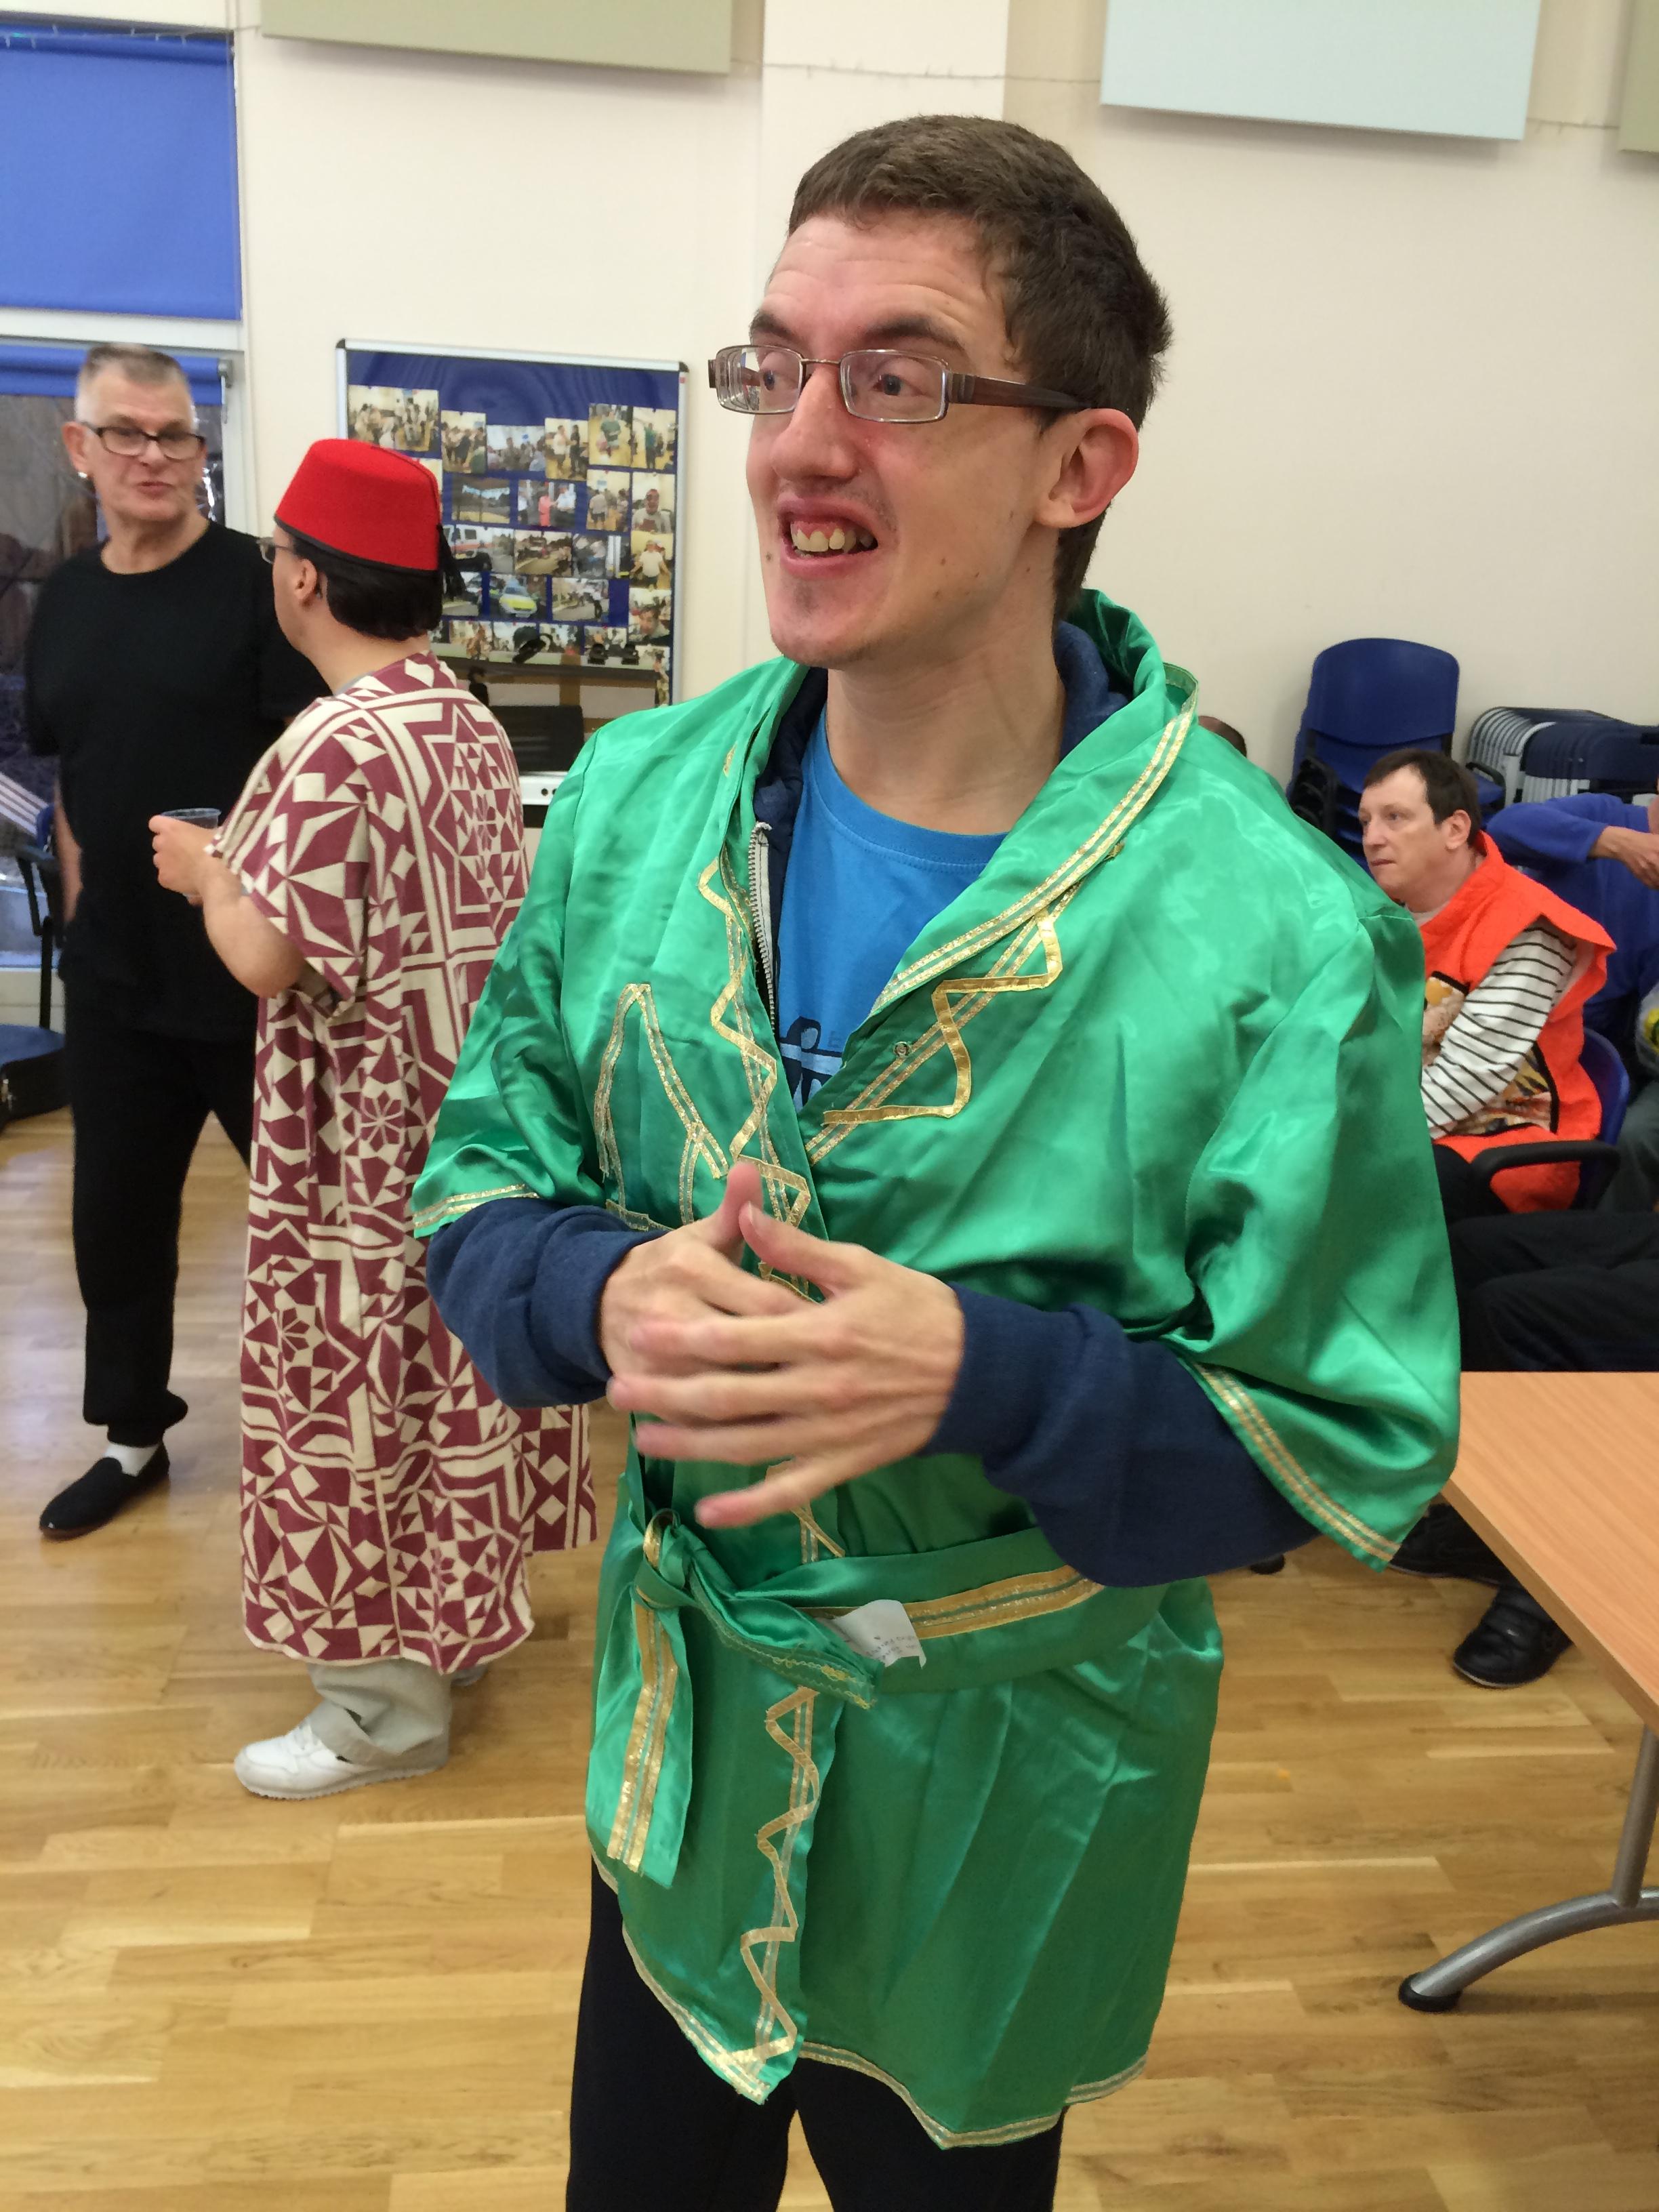 One of Aladdin's friends